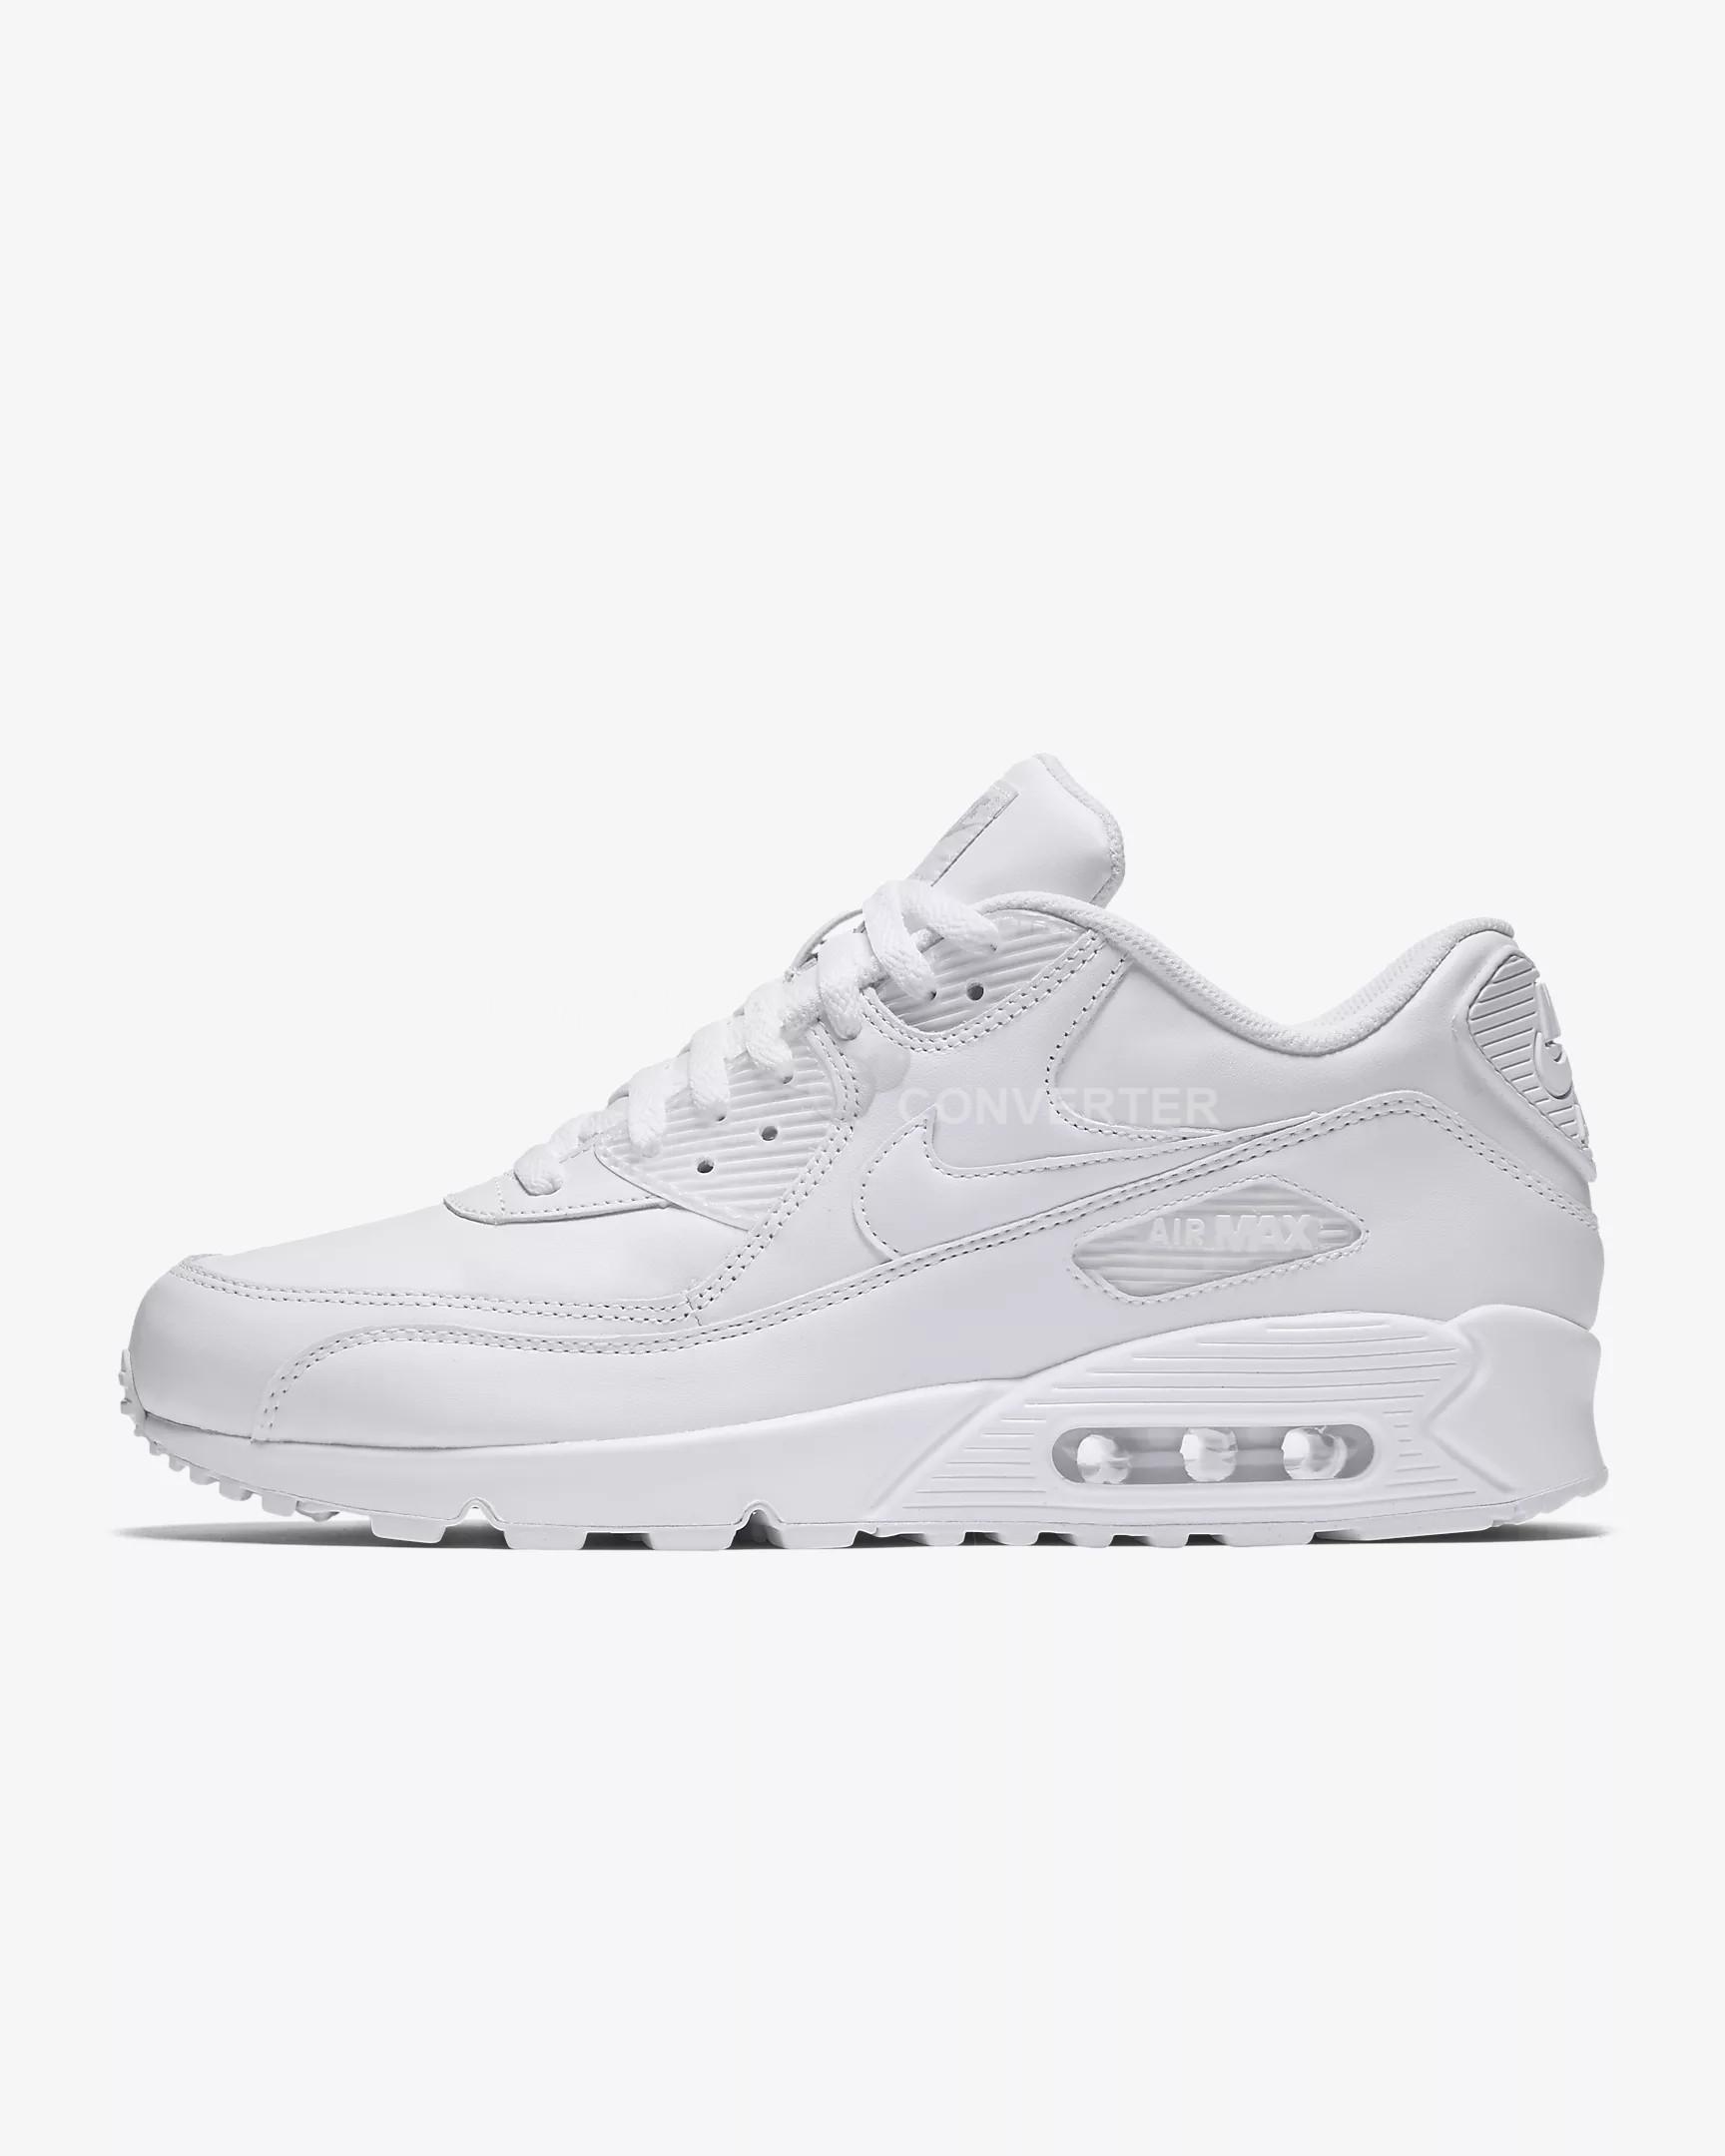 585e0498 Nike Air Max 90 Leather. Распродажа! 🔍. 396 руб.